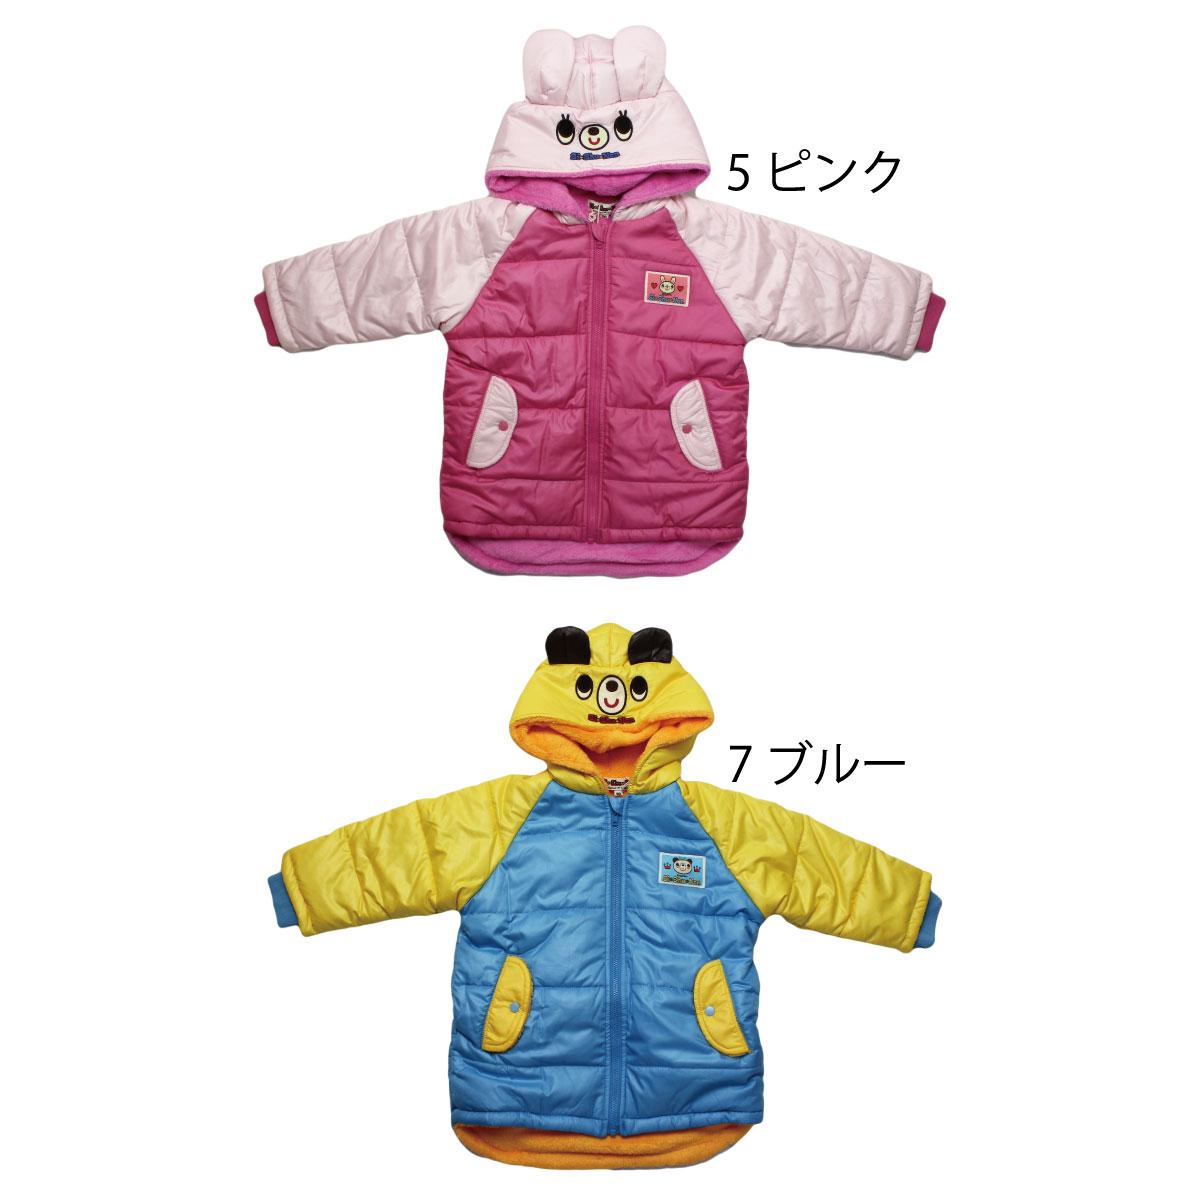 【SiShuNon/シシュノン】クマウサフードナイロンコート ベビー服 子供服 男の子 女の子 クマ ウサギ フード コート 防寒